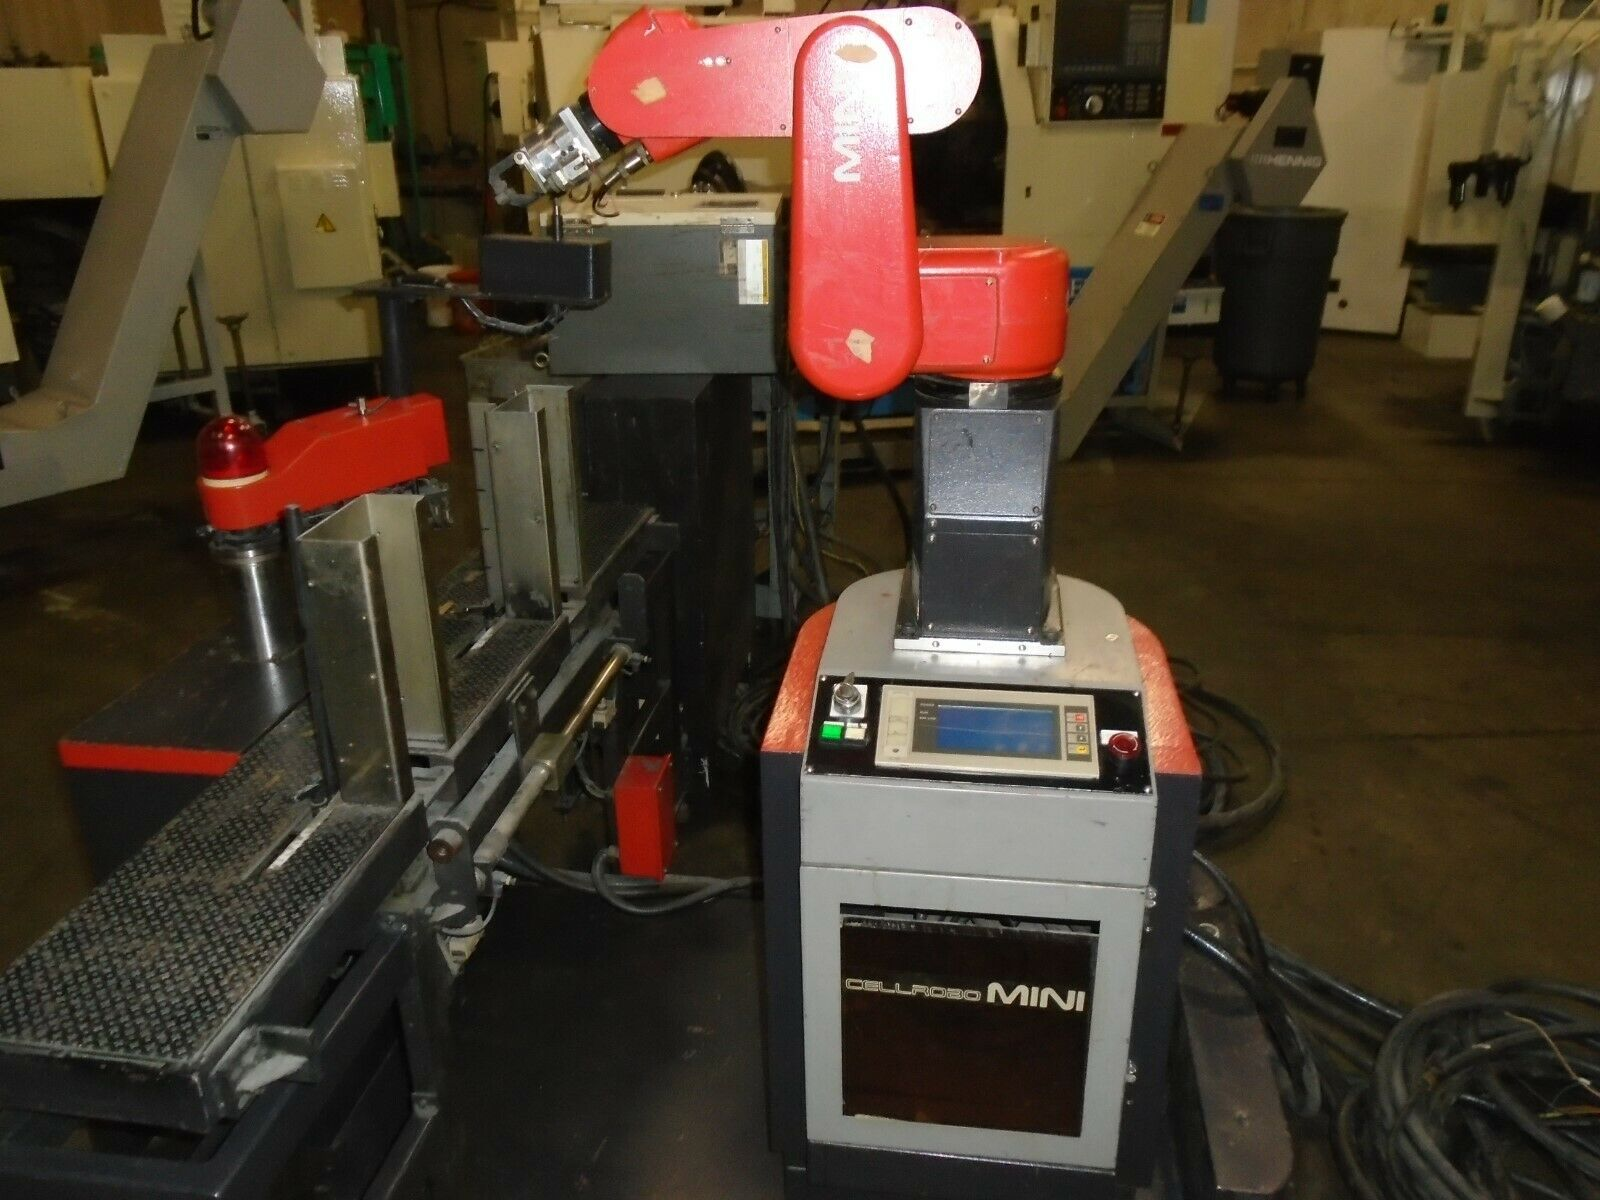 Fanuc Robot LR Mate 100 A5B-1131-8001 Mini Cel R-J2 Control - Image 4 of 12